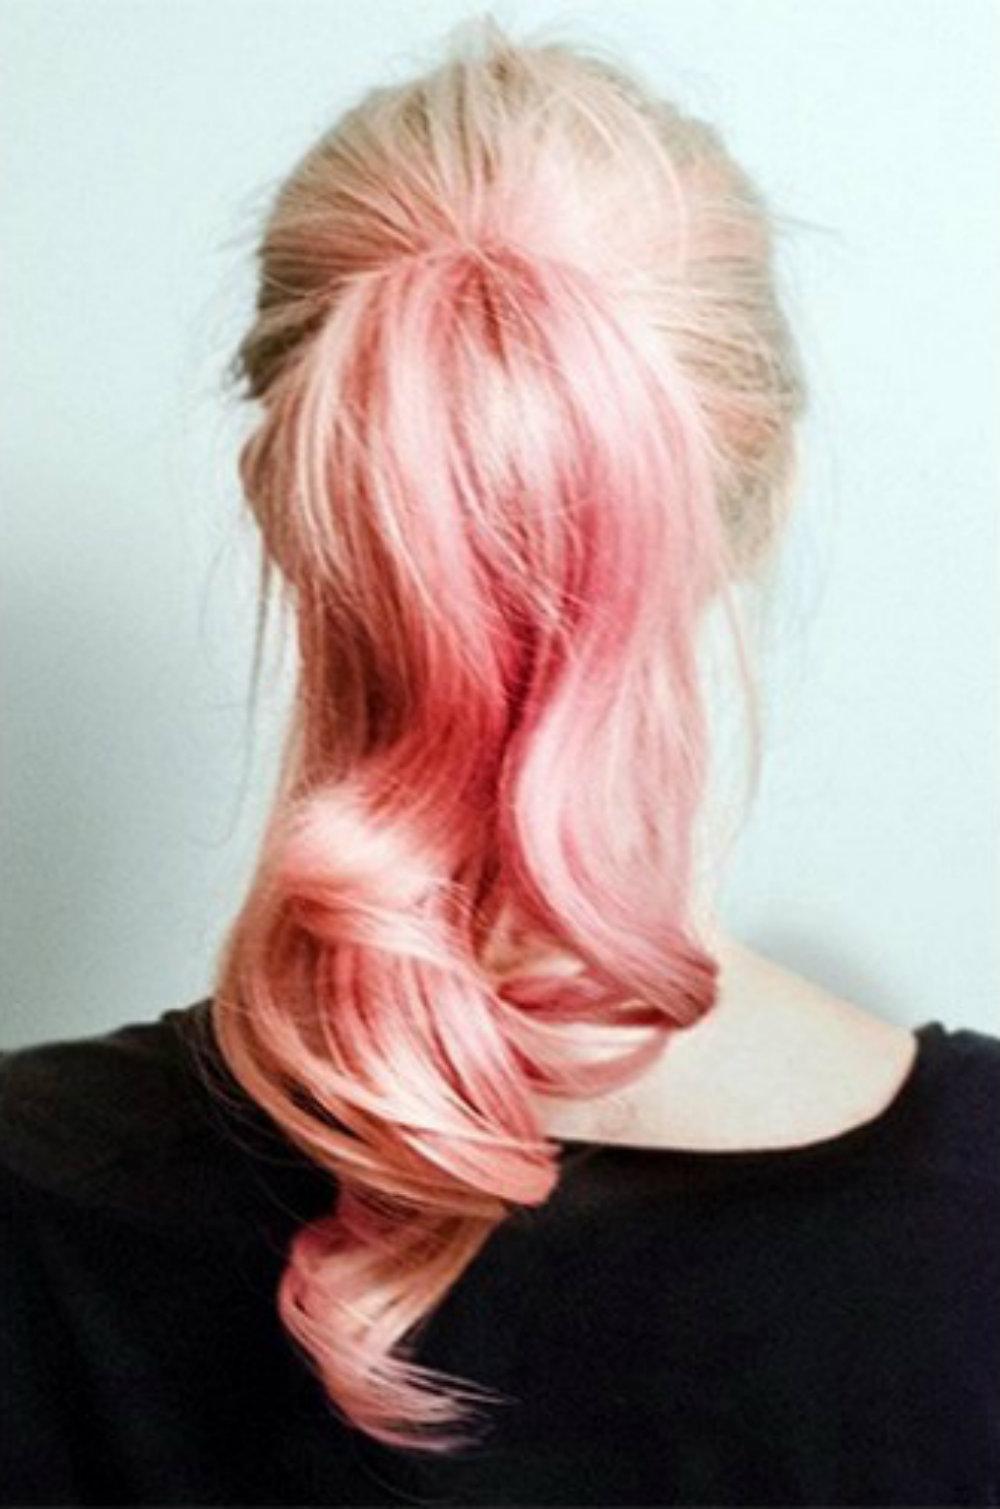 Прически с мелками для волос: фото 19